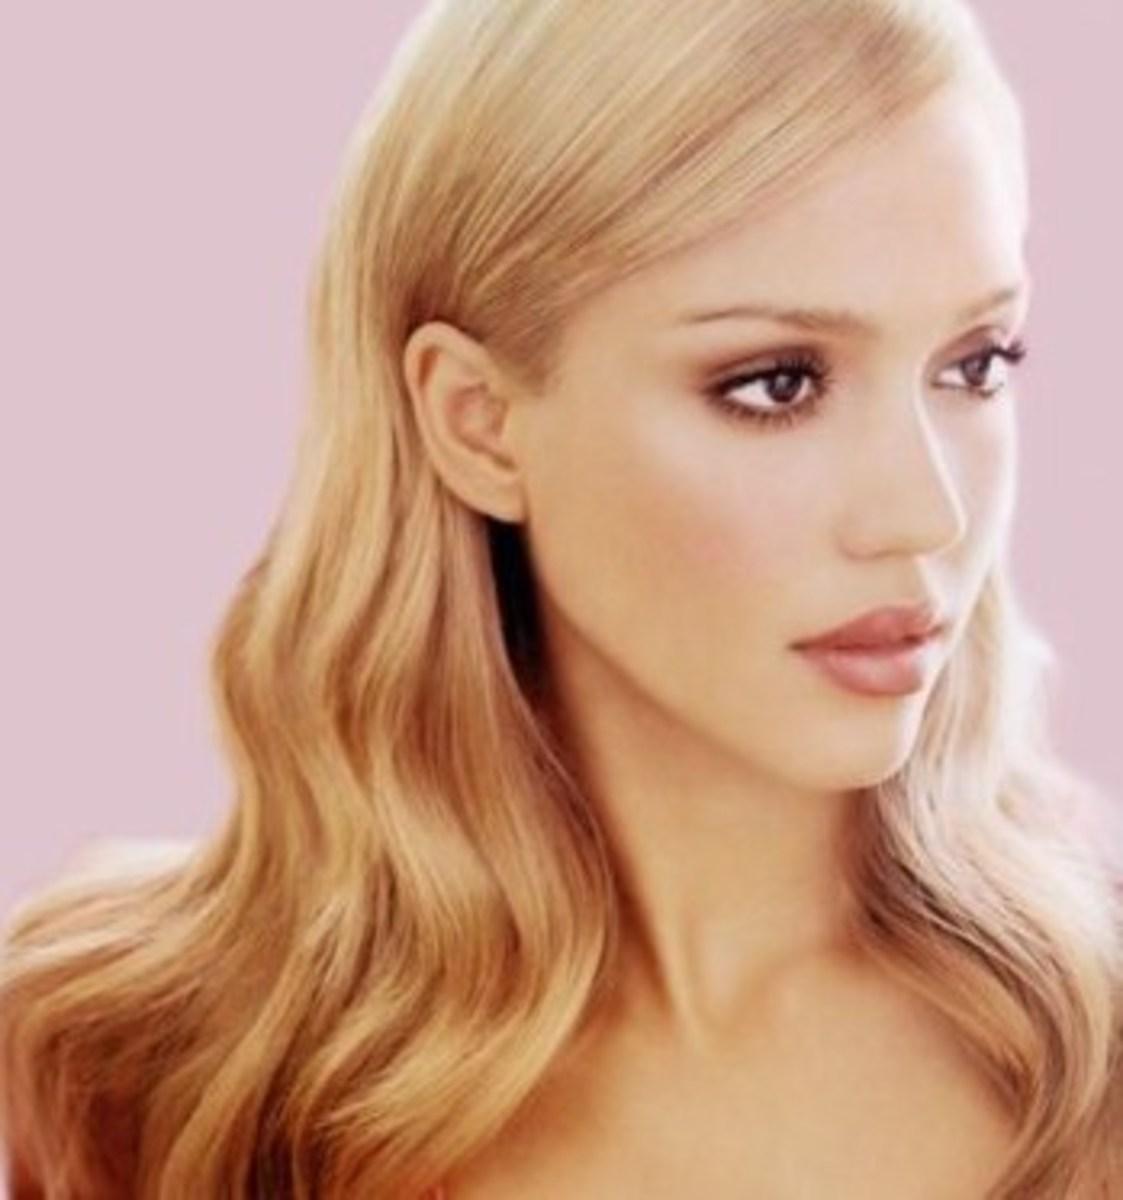 Jessica Alba with Blonde Hair